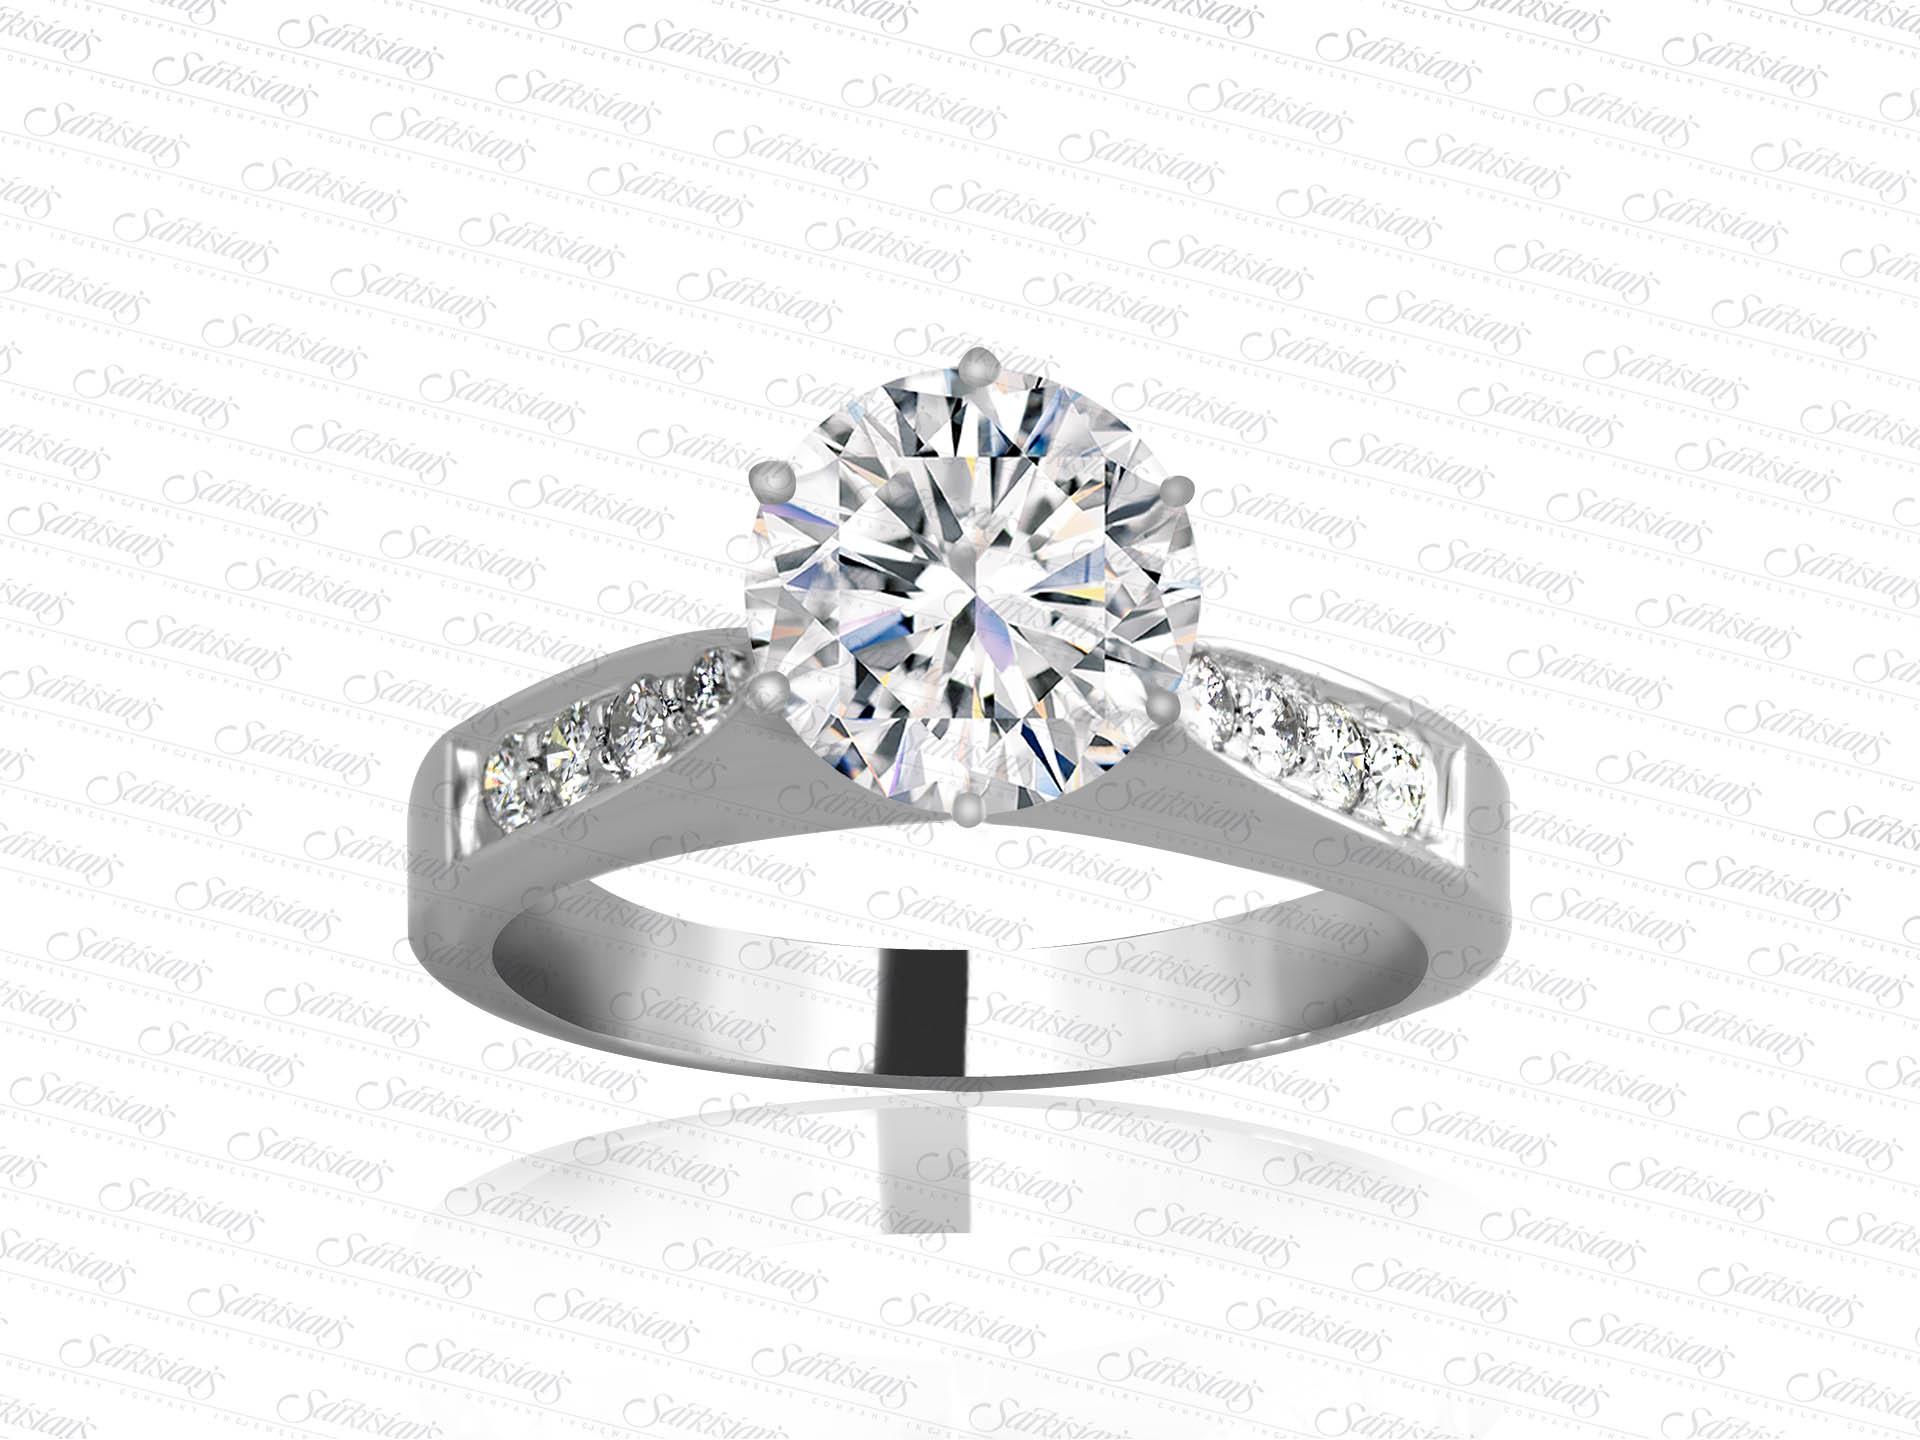 Bead Set Diamond Engagement Ring, Gold or Platinum - Sarkisians Jewelry